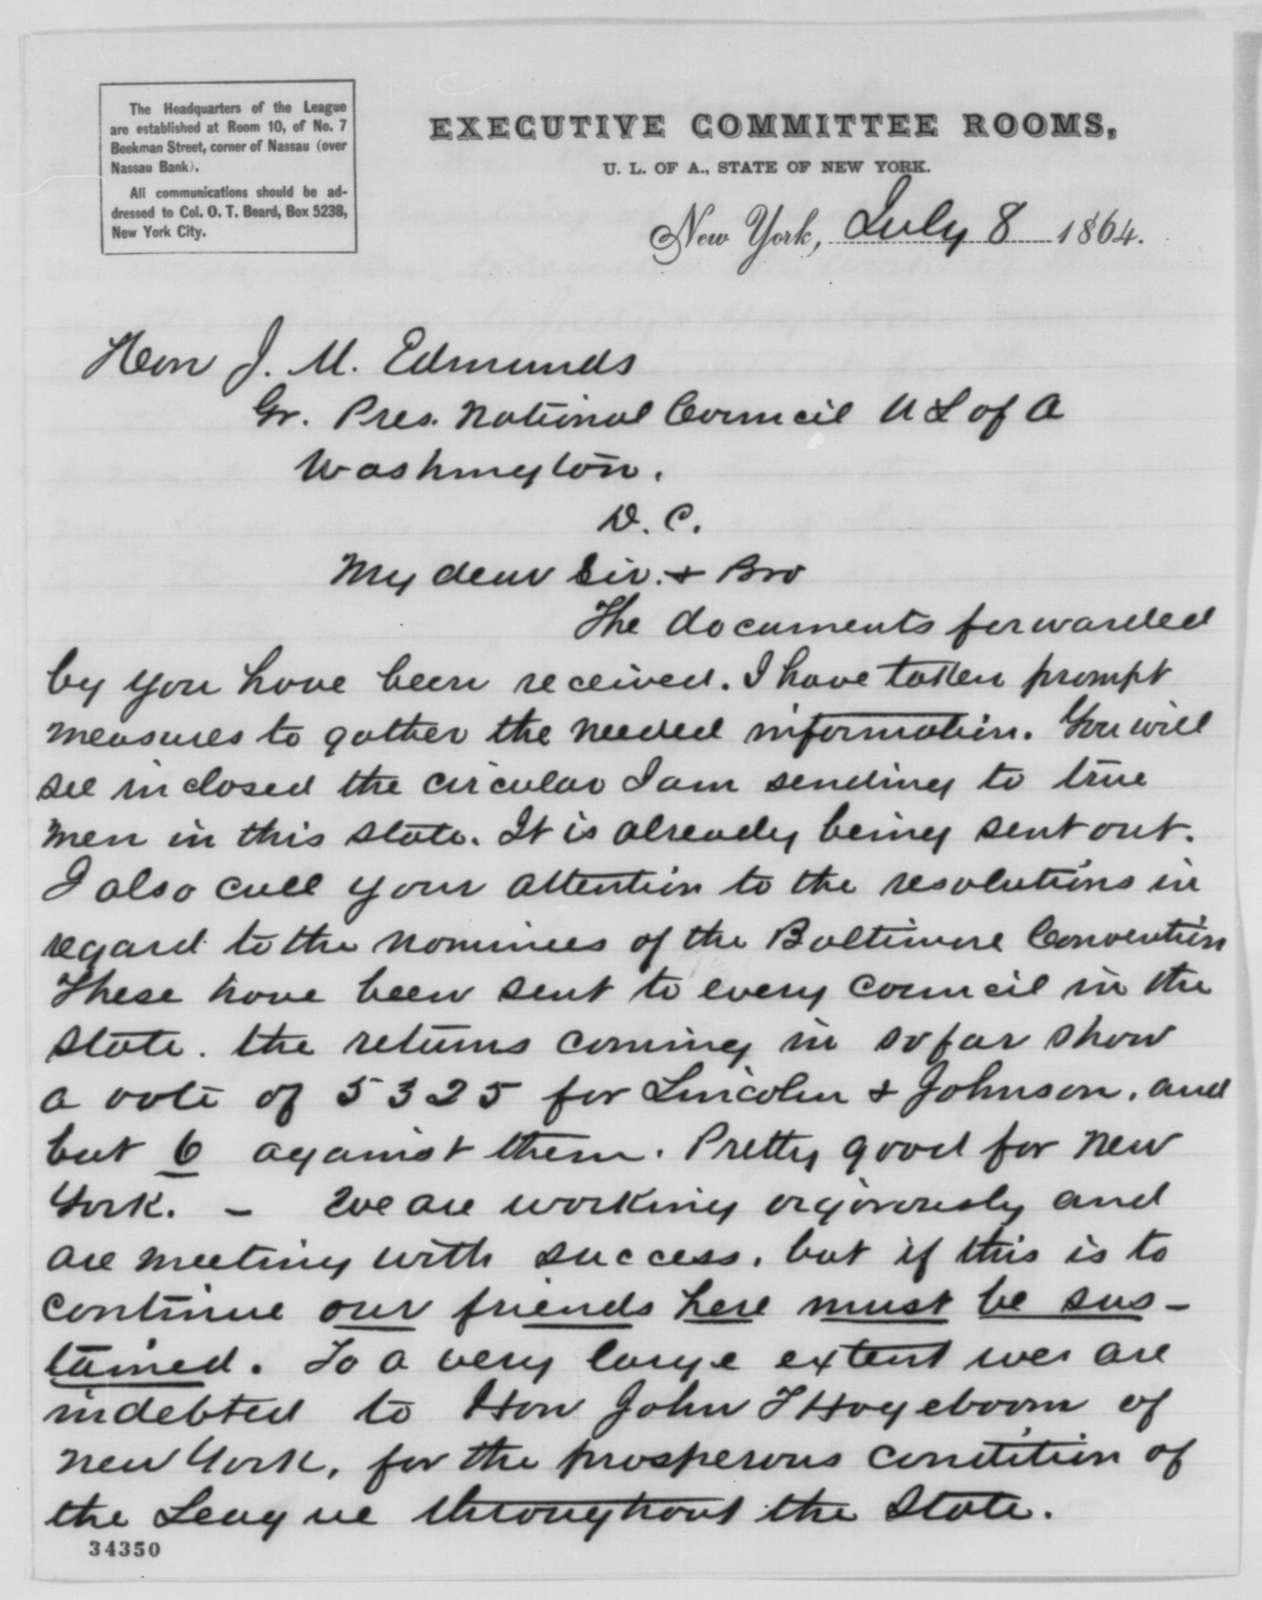 Oliver F. Beard to James M. Edmunds, Friday, July 08, 1864  (Political affairs)